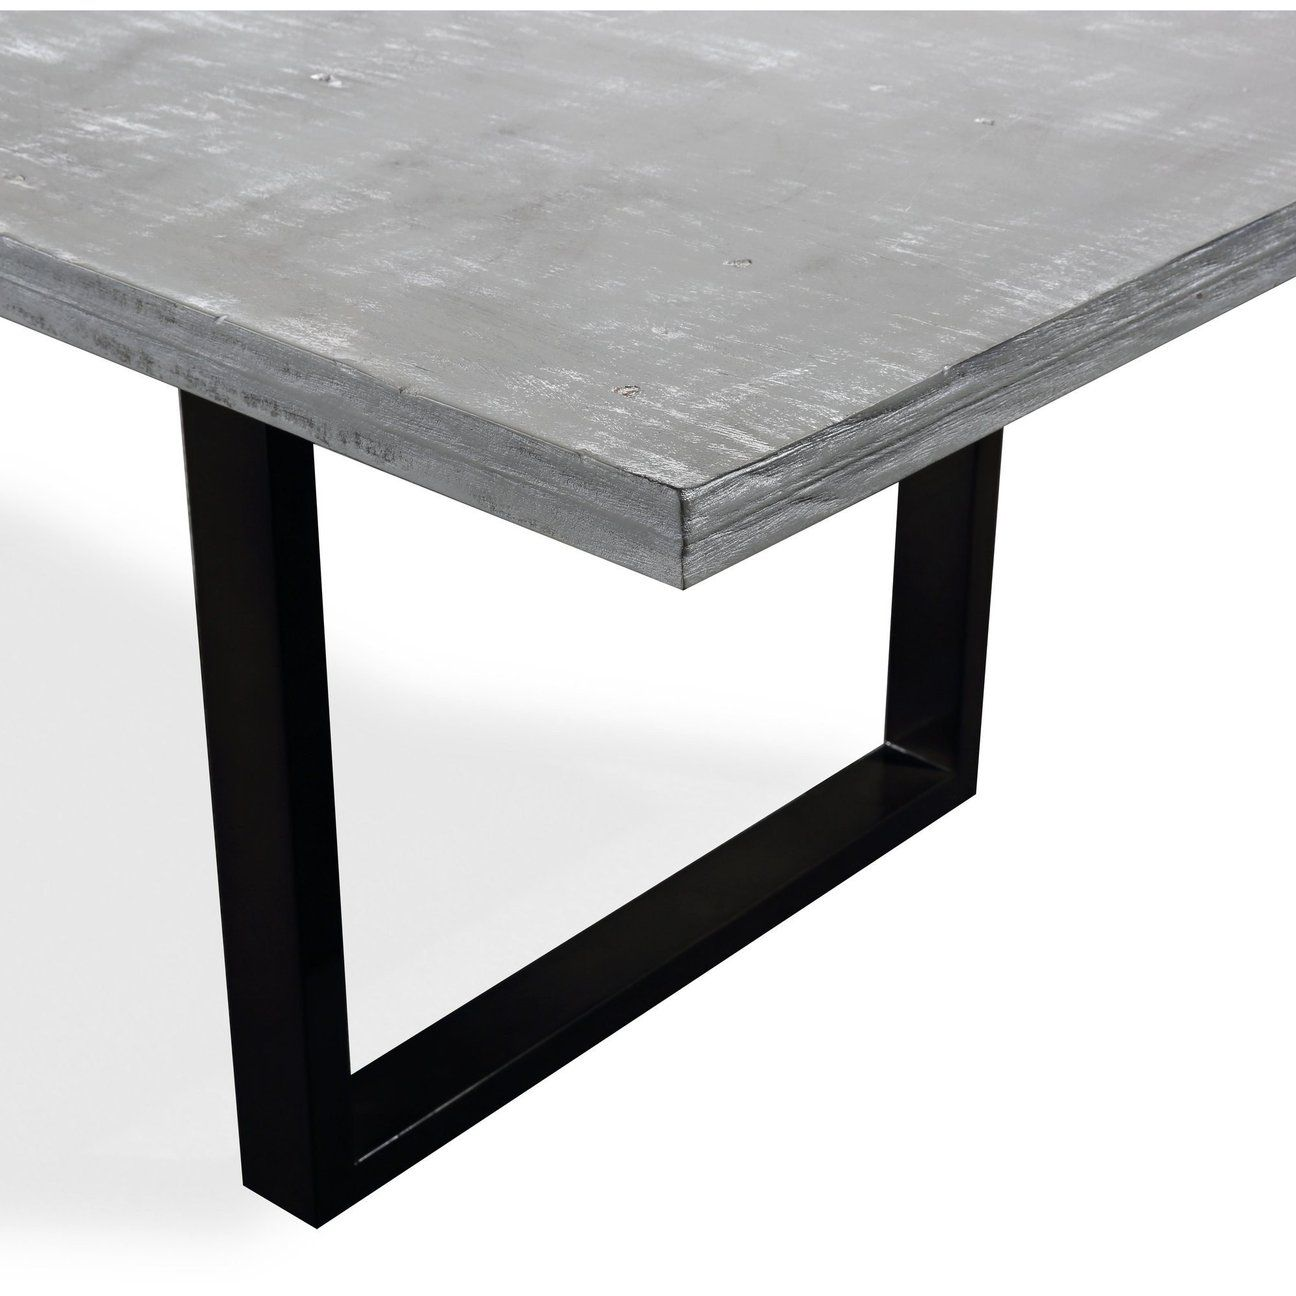 Tov Furniture Modern Urban Light Concrete Table Tov G5451 Concrete Dining Table Furniture Modern Furniture